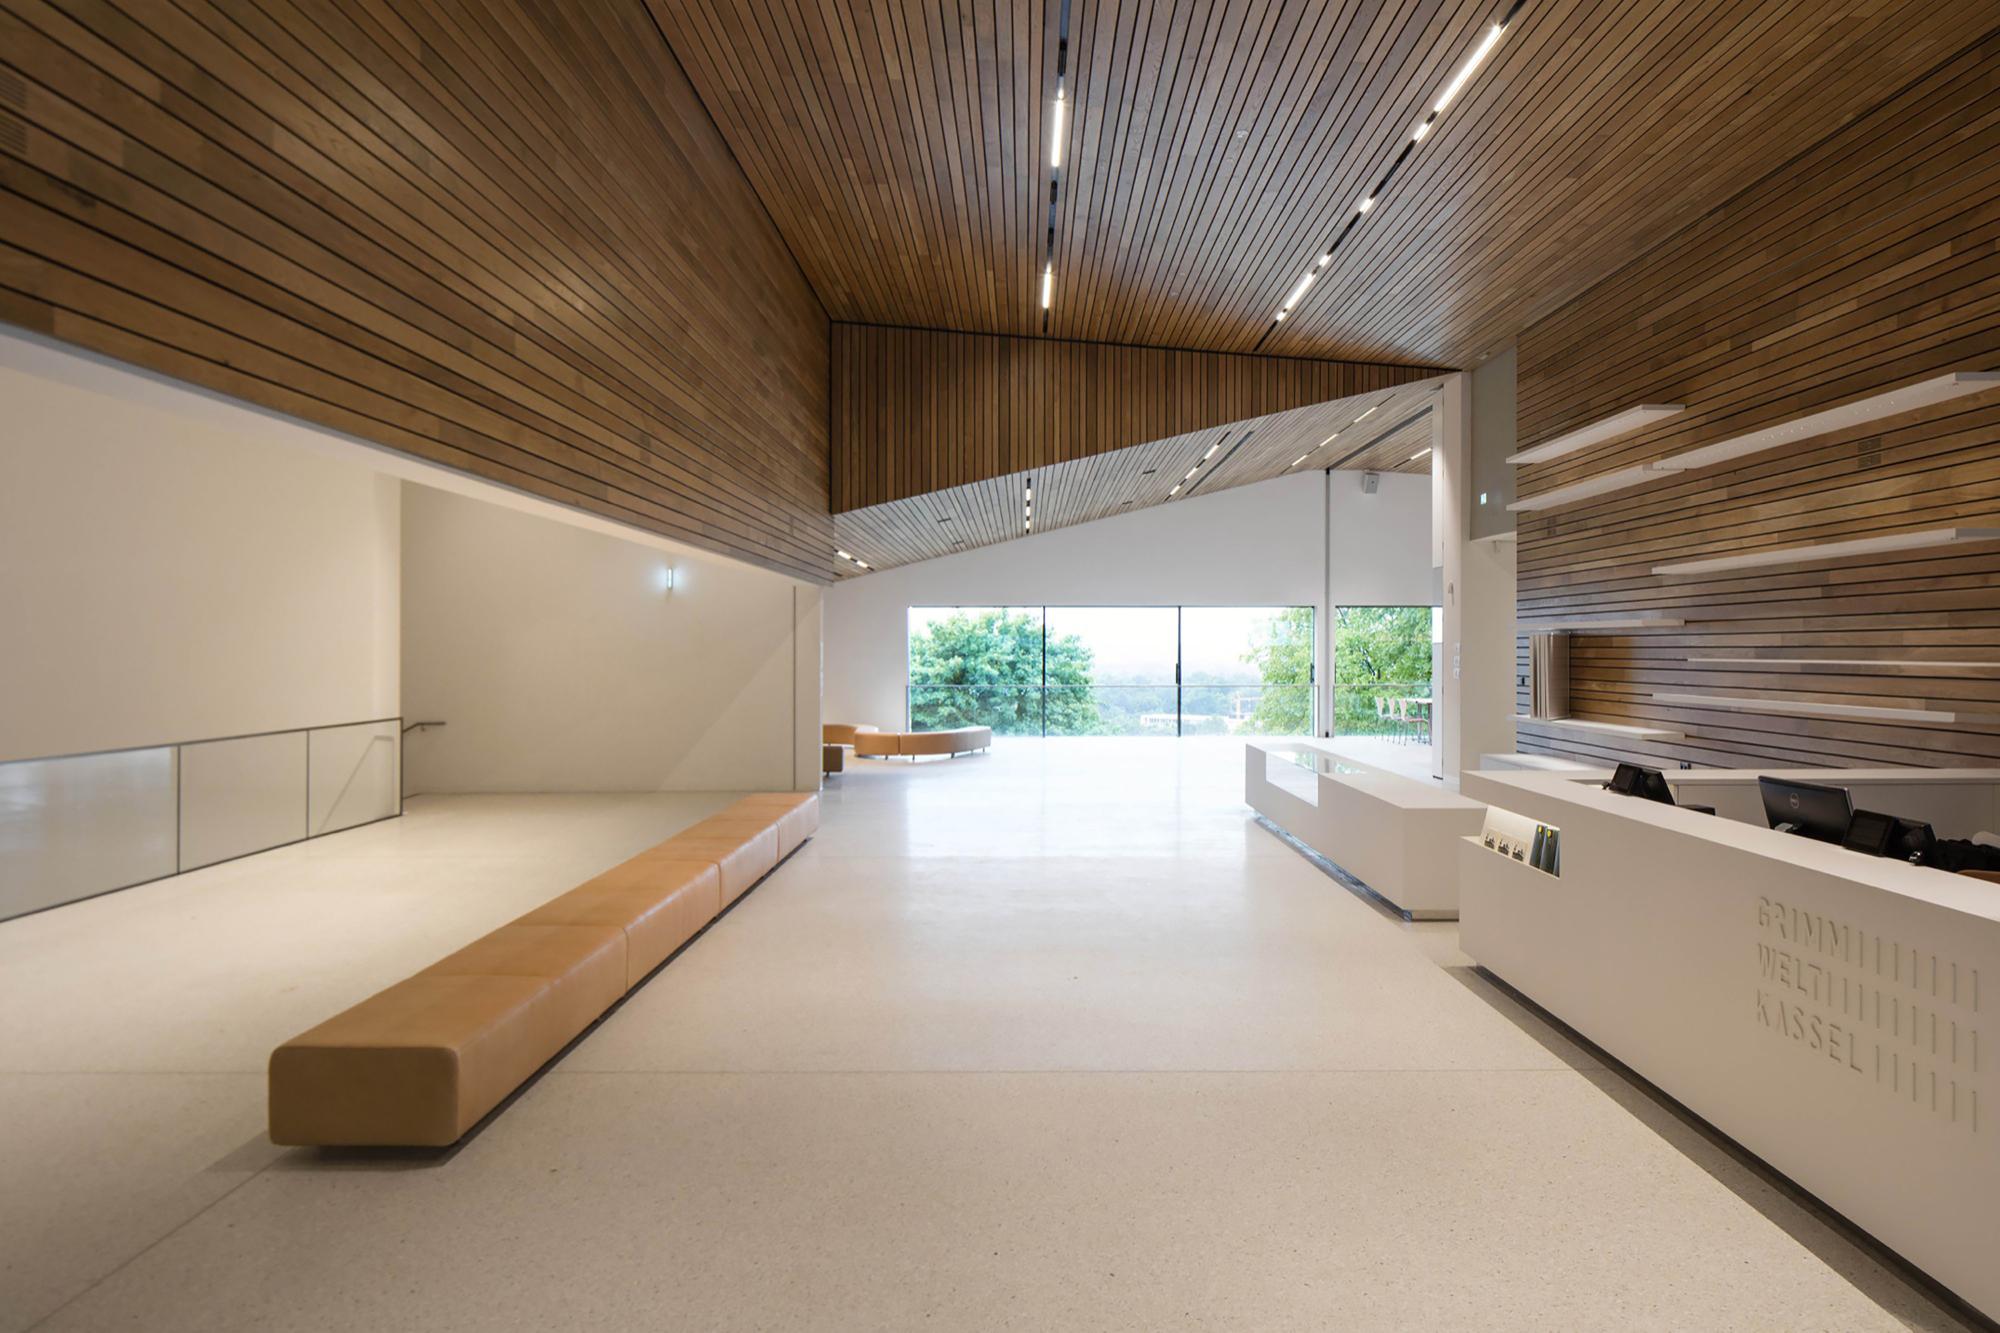 gallery of grimmwelt kadawittfeldarchitektur 4. Black Bedroom Furniture Sets. Home Design Ideas